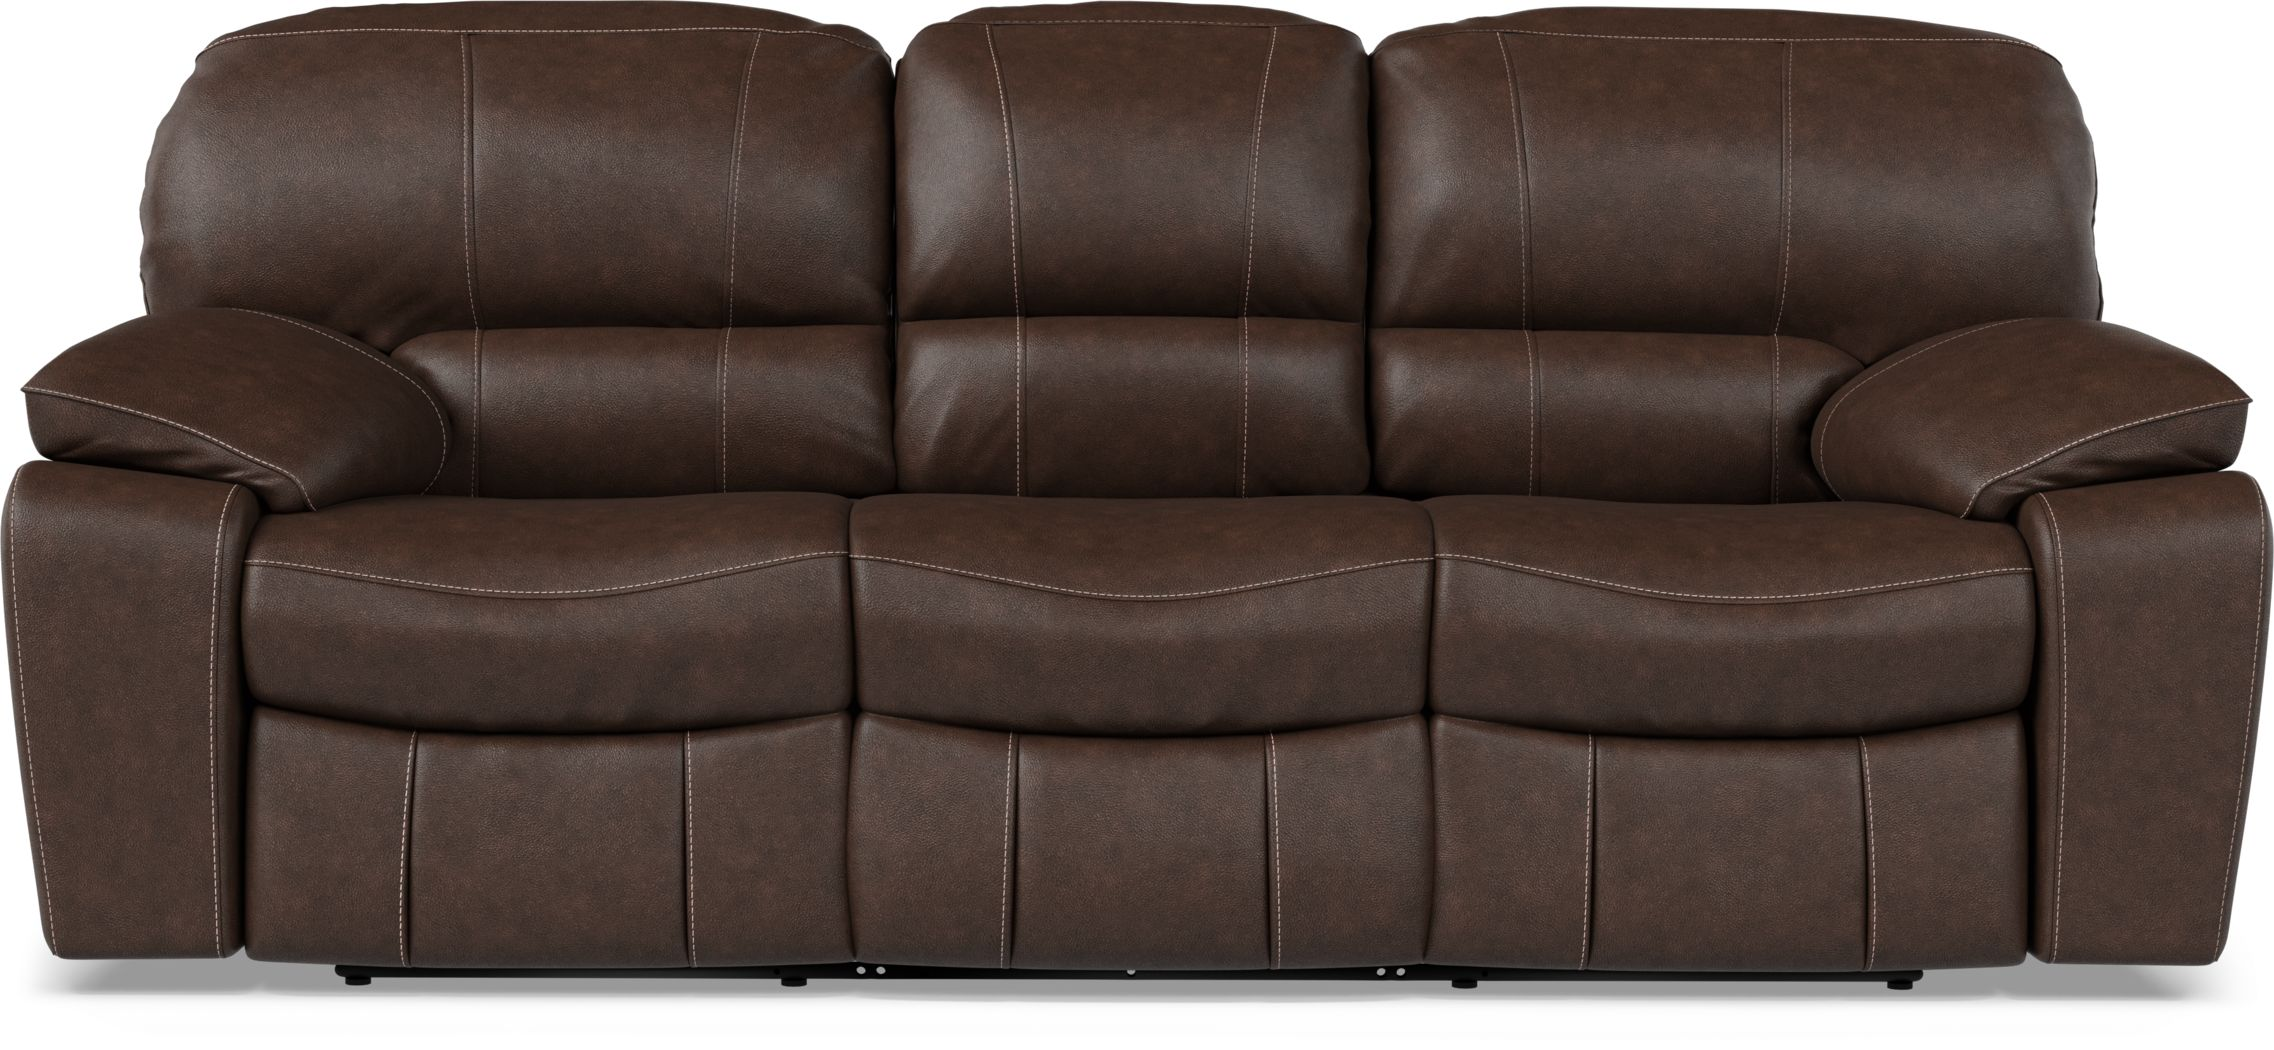 Cindy Crawford Home San Gabriel Brown Leather Power Reclining Sofa